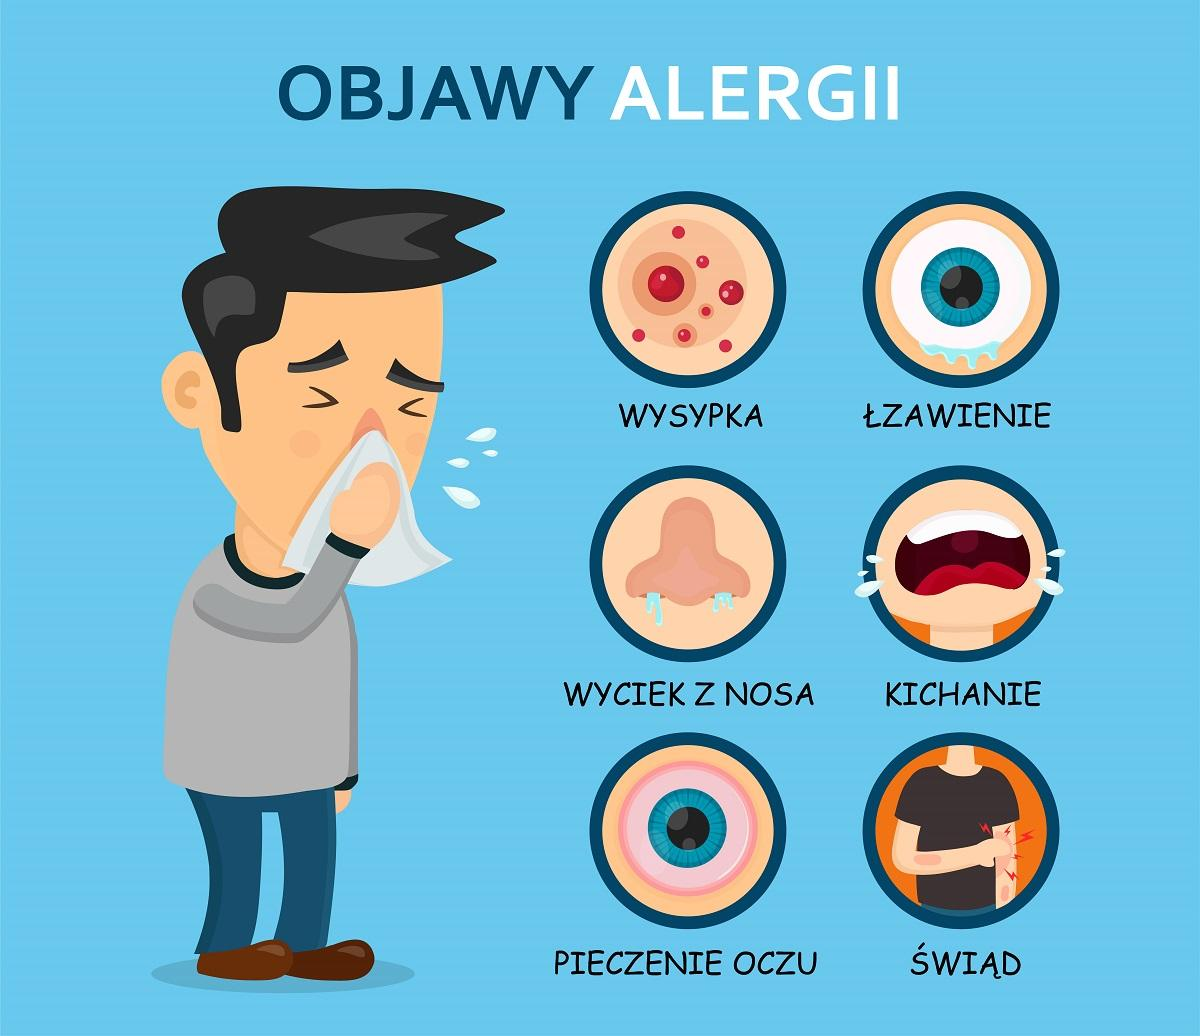 objawy alergii popularne